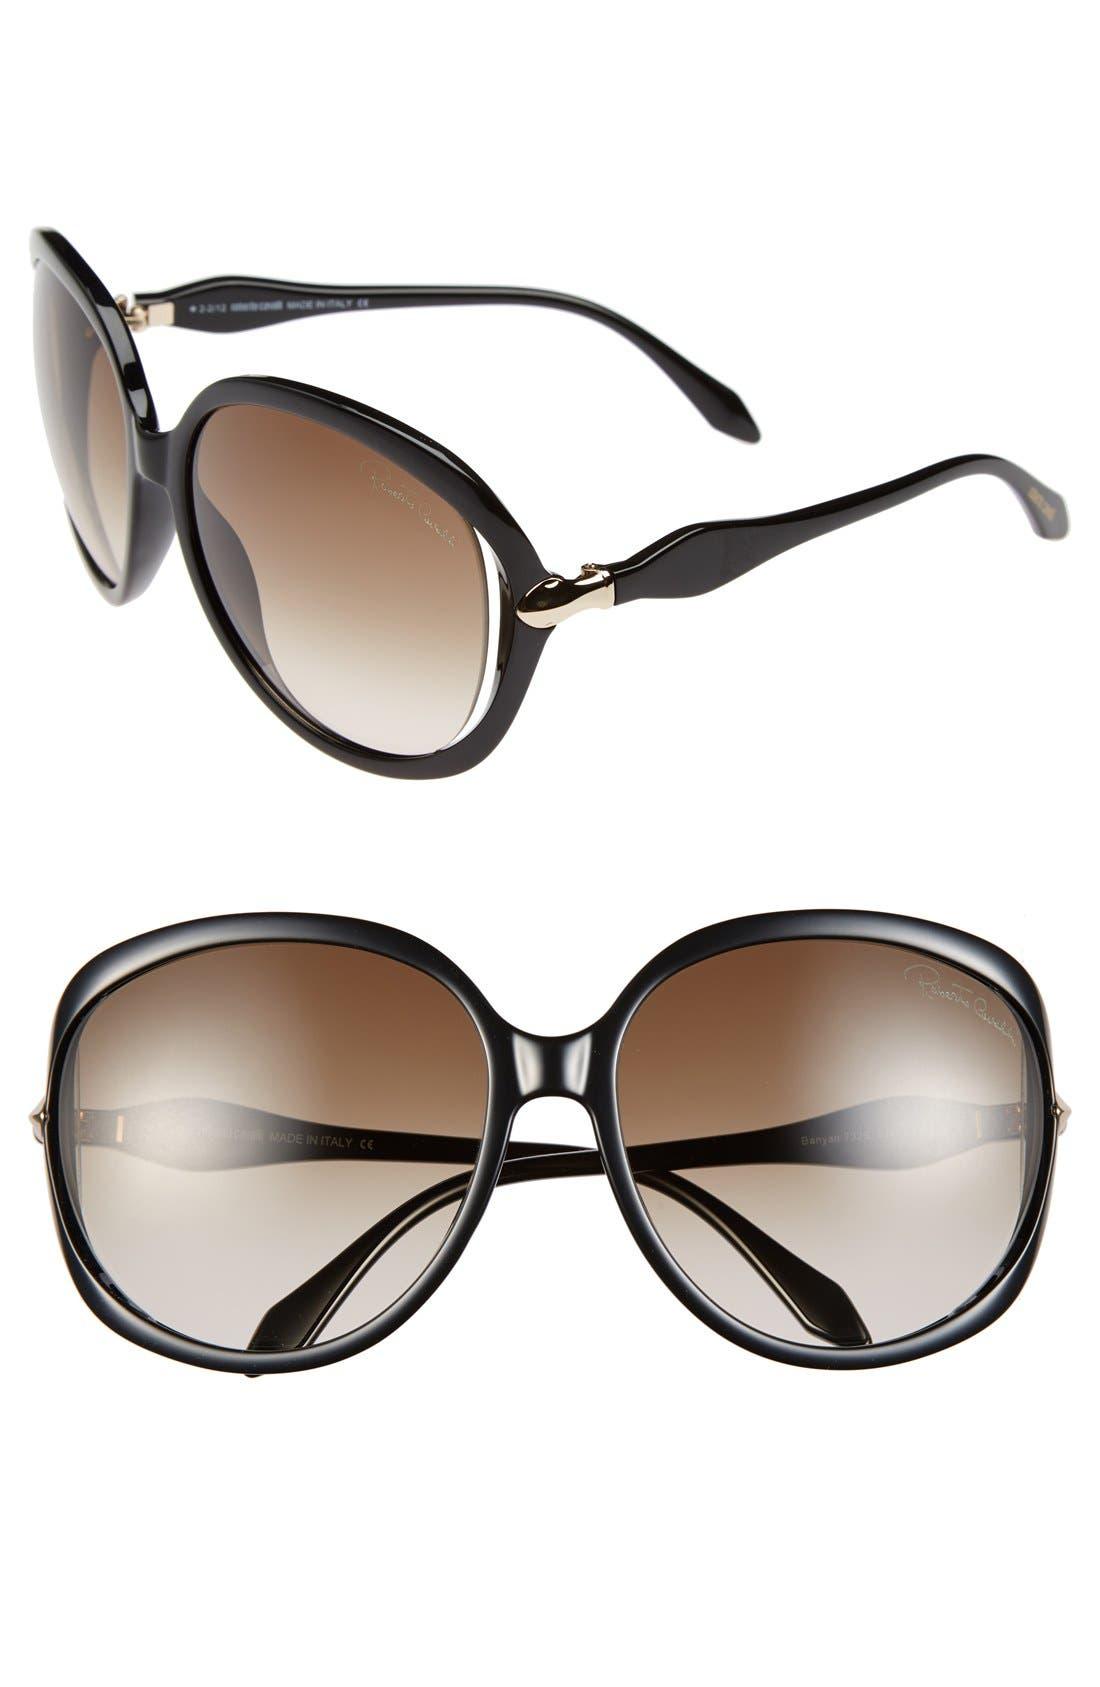 Main Image - Roberto Cavalli 61mm Oversized Sunglasses